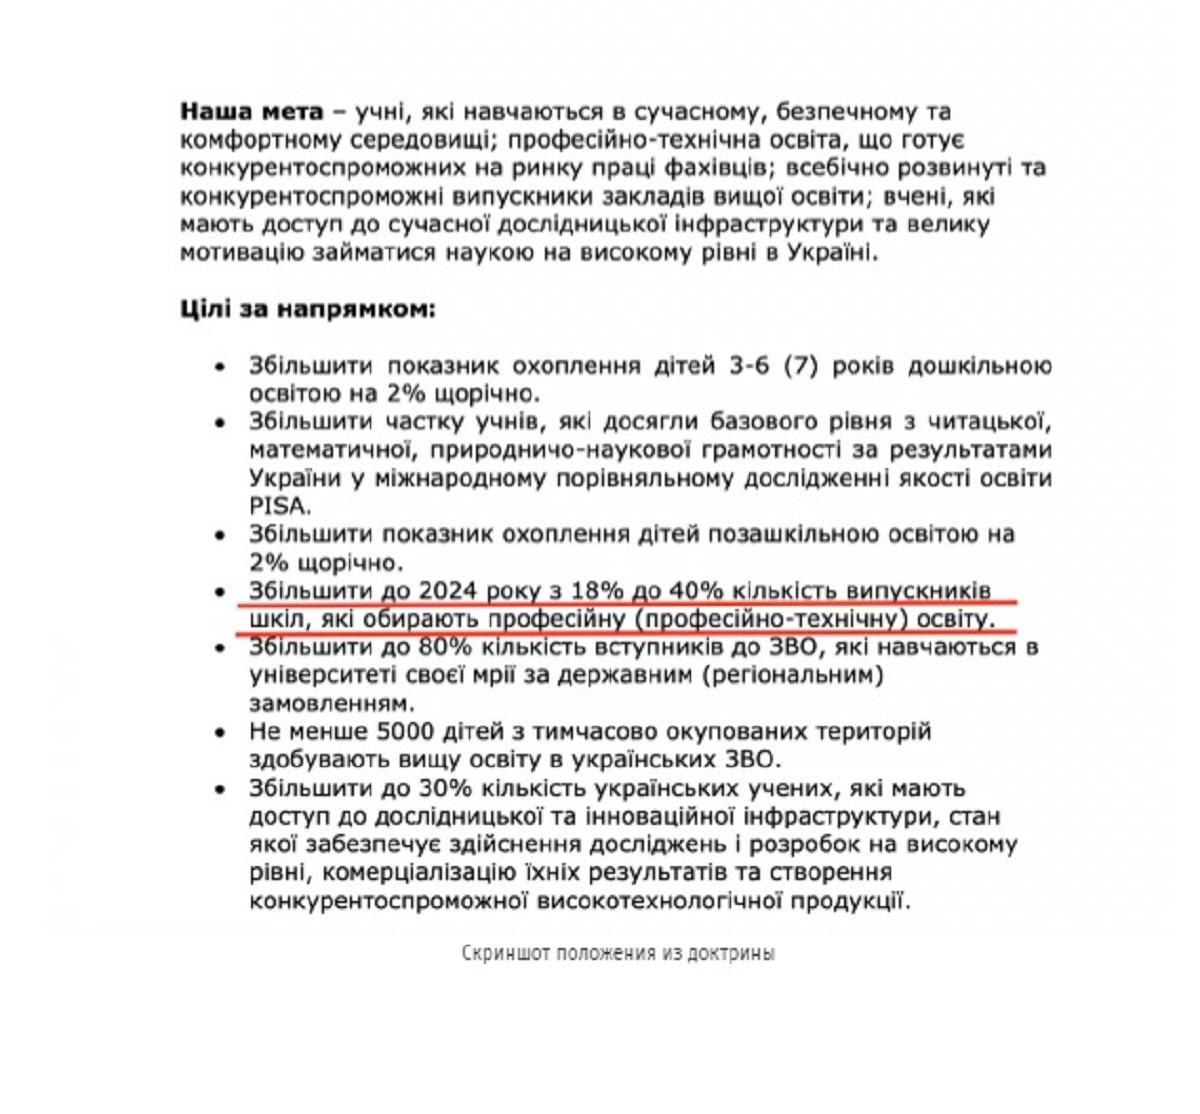 Страна ПТУ-шников: новая доктрина Слуги народа - фото 1